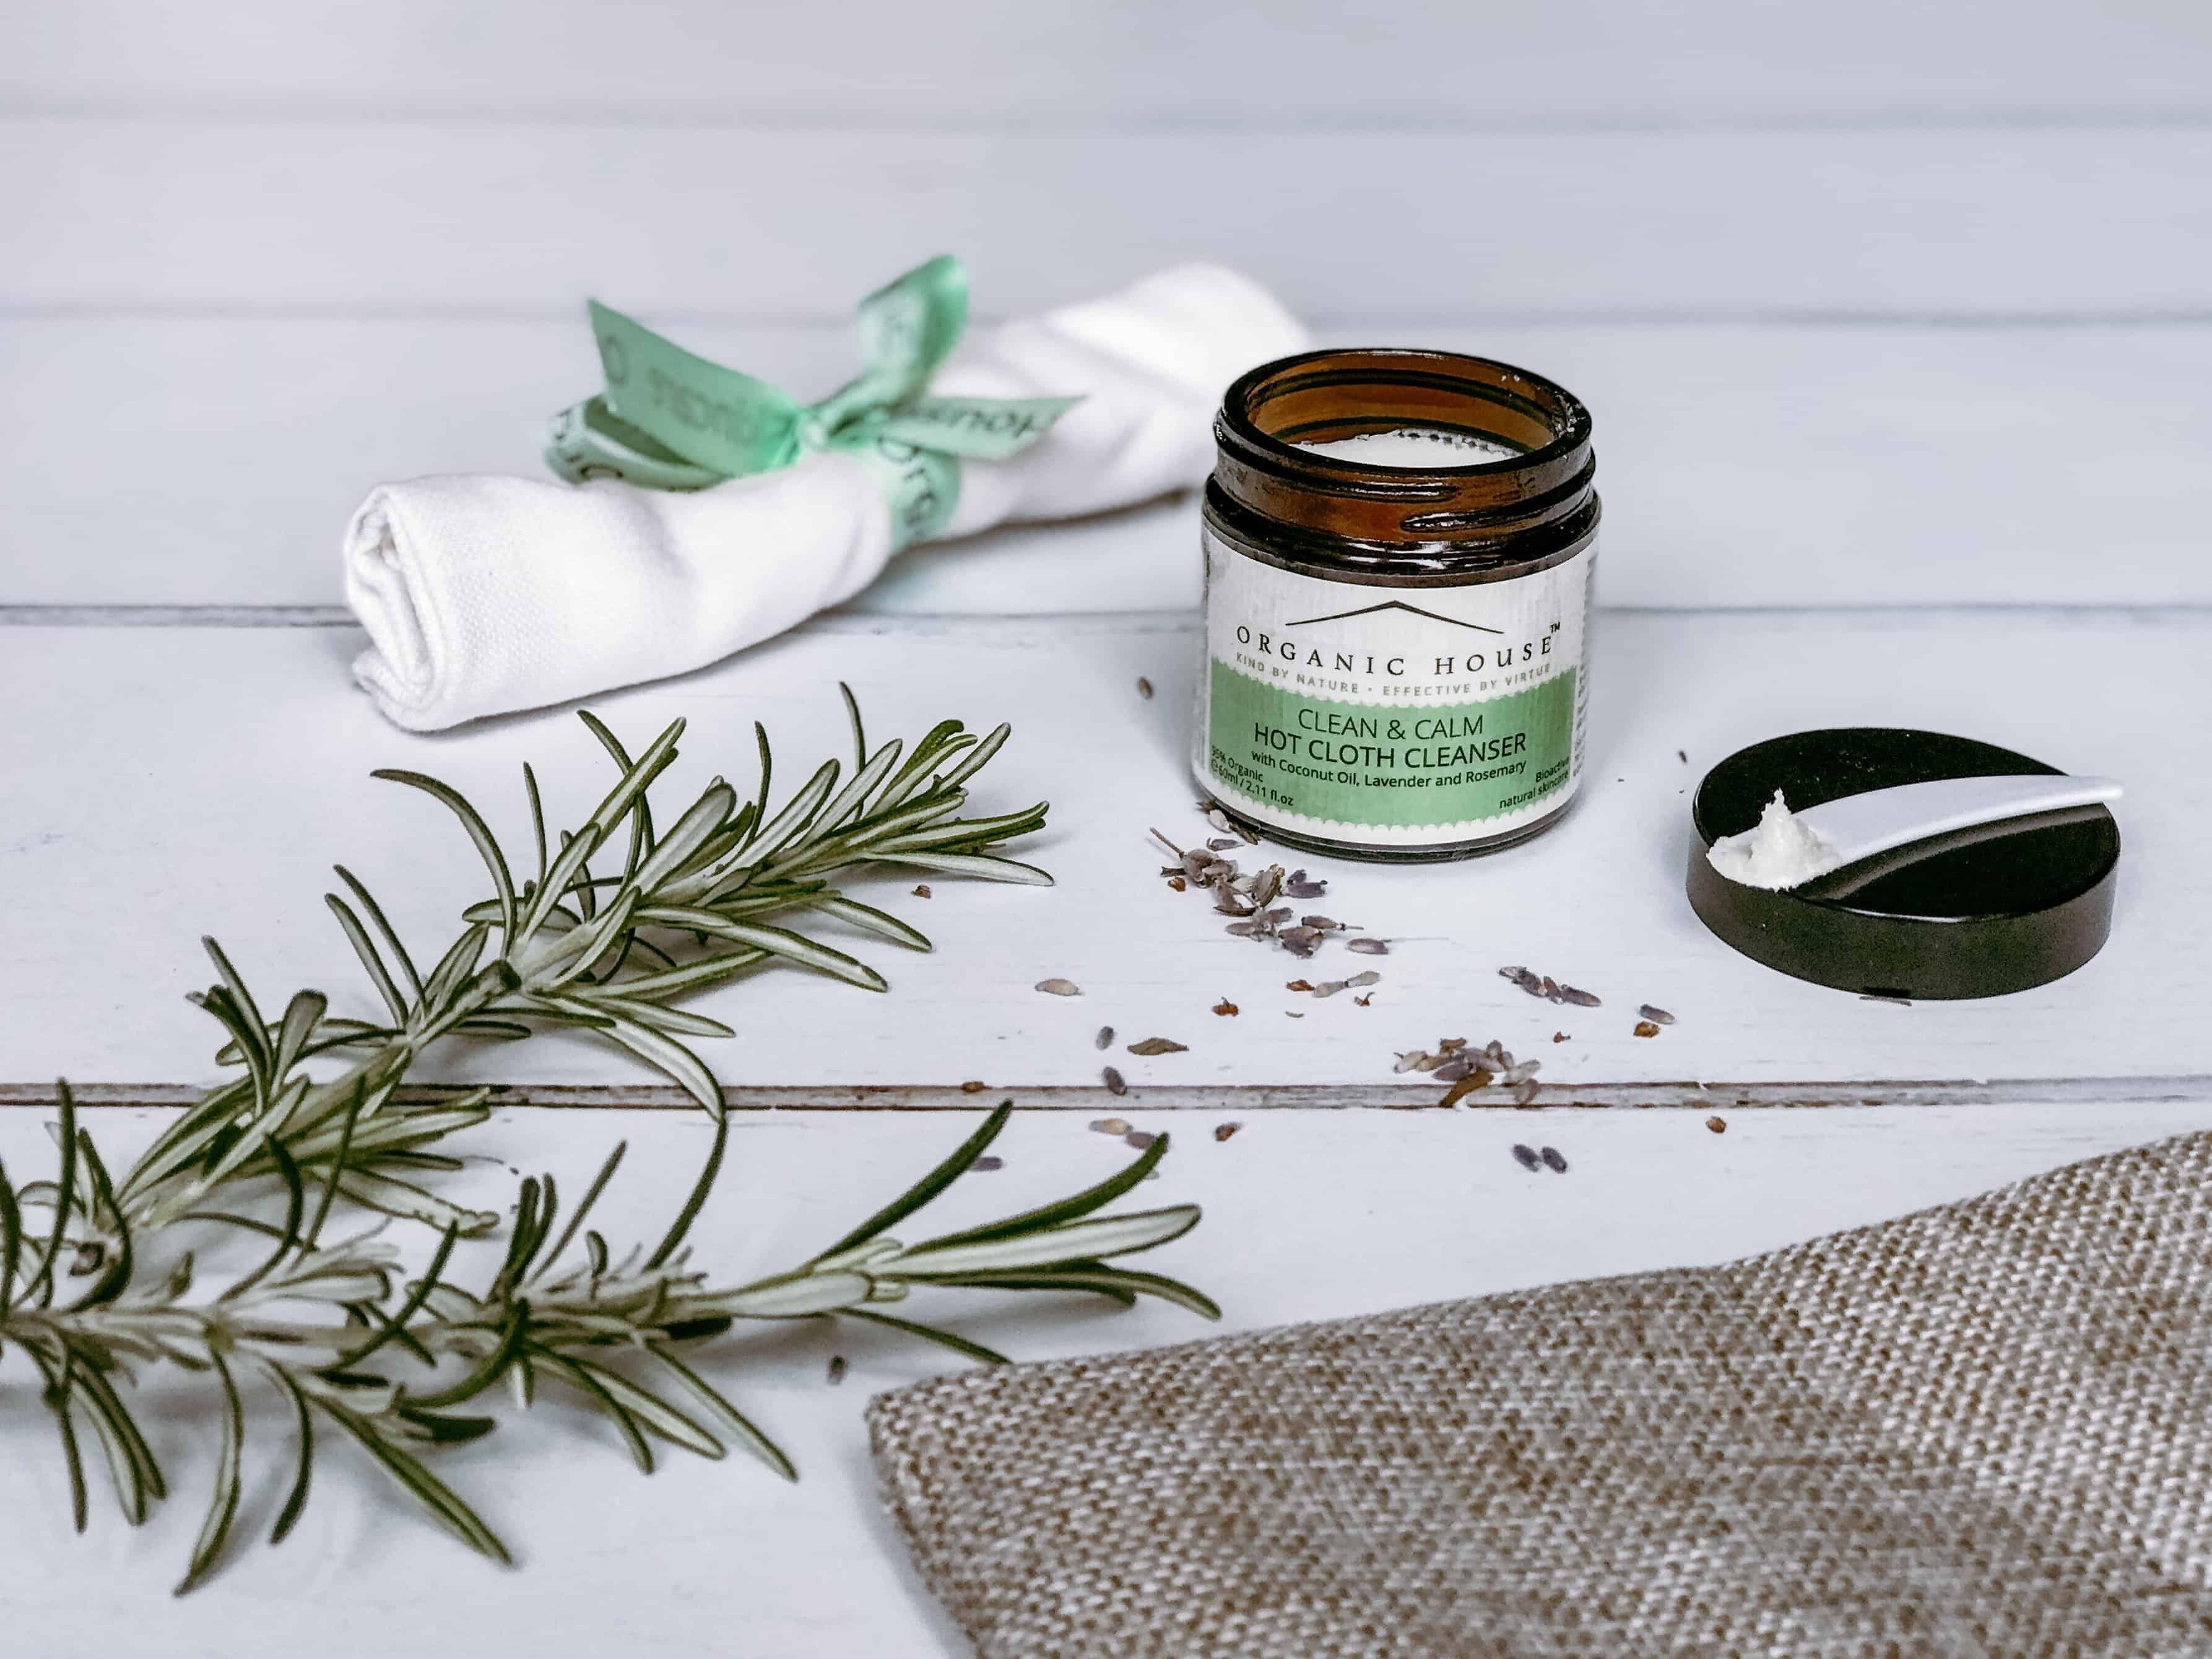 Organic House Clean & Calm Hot Cloth Cleanser Review